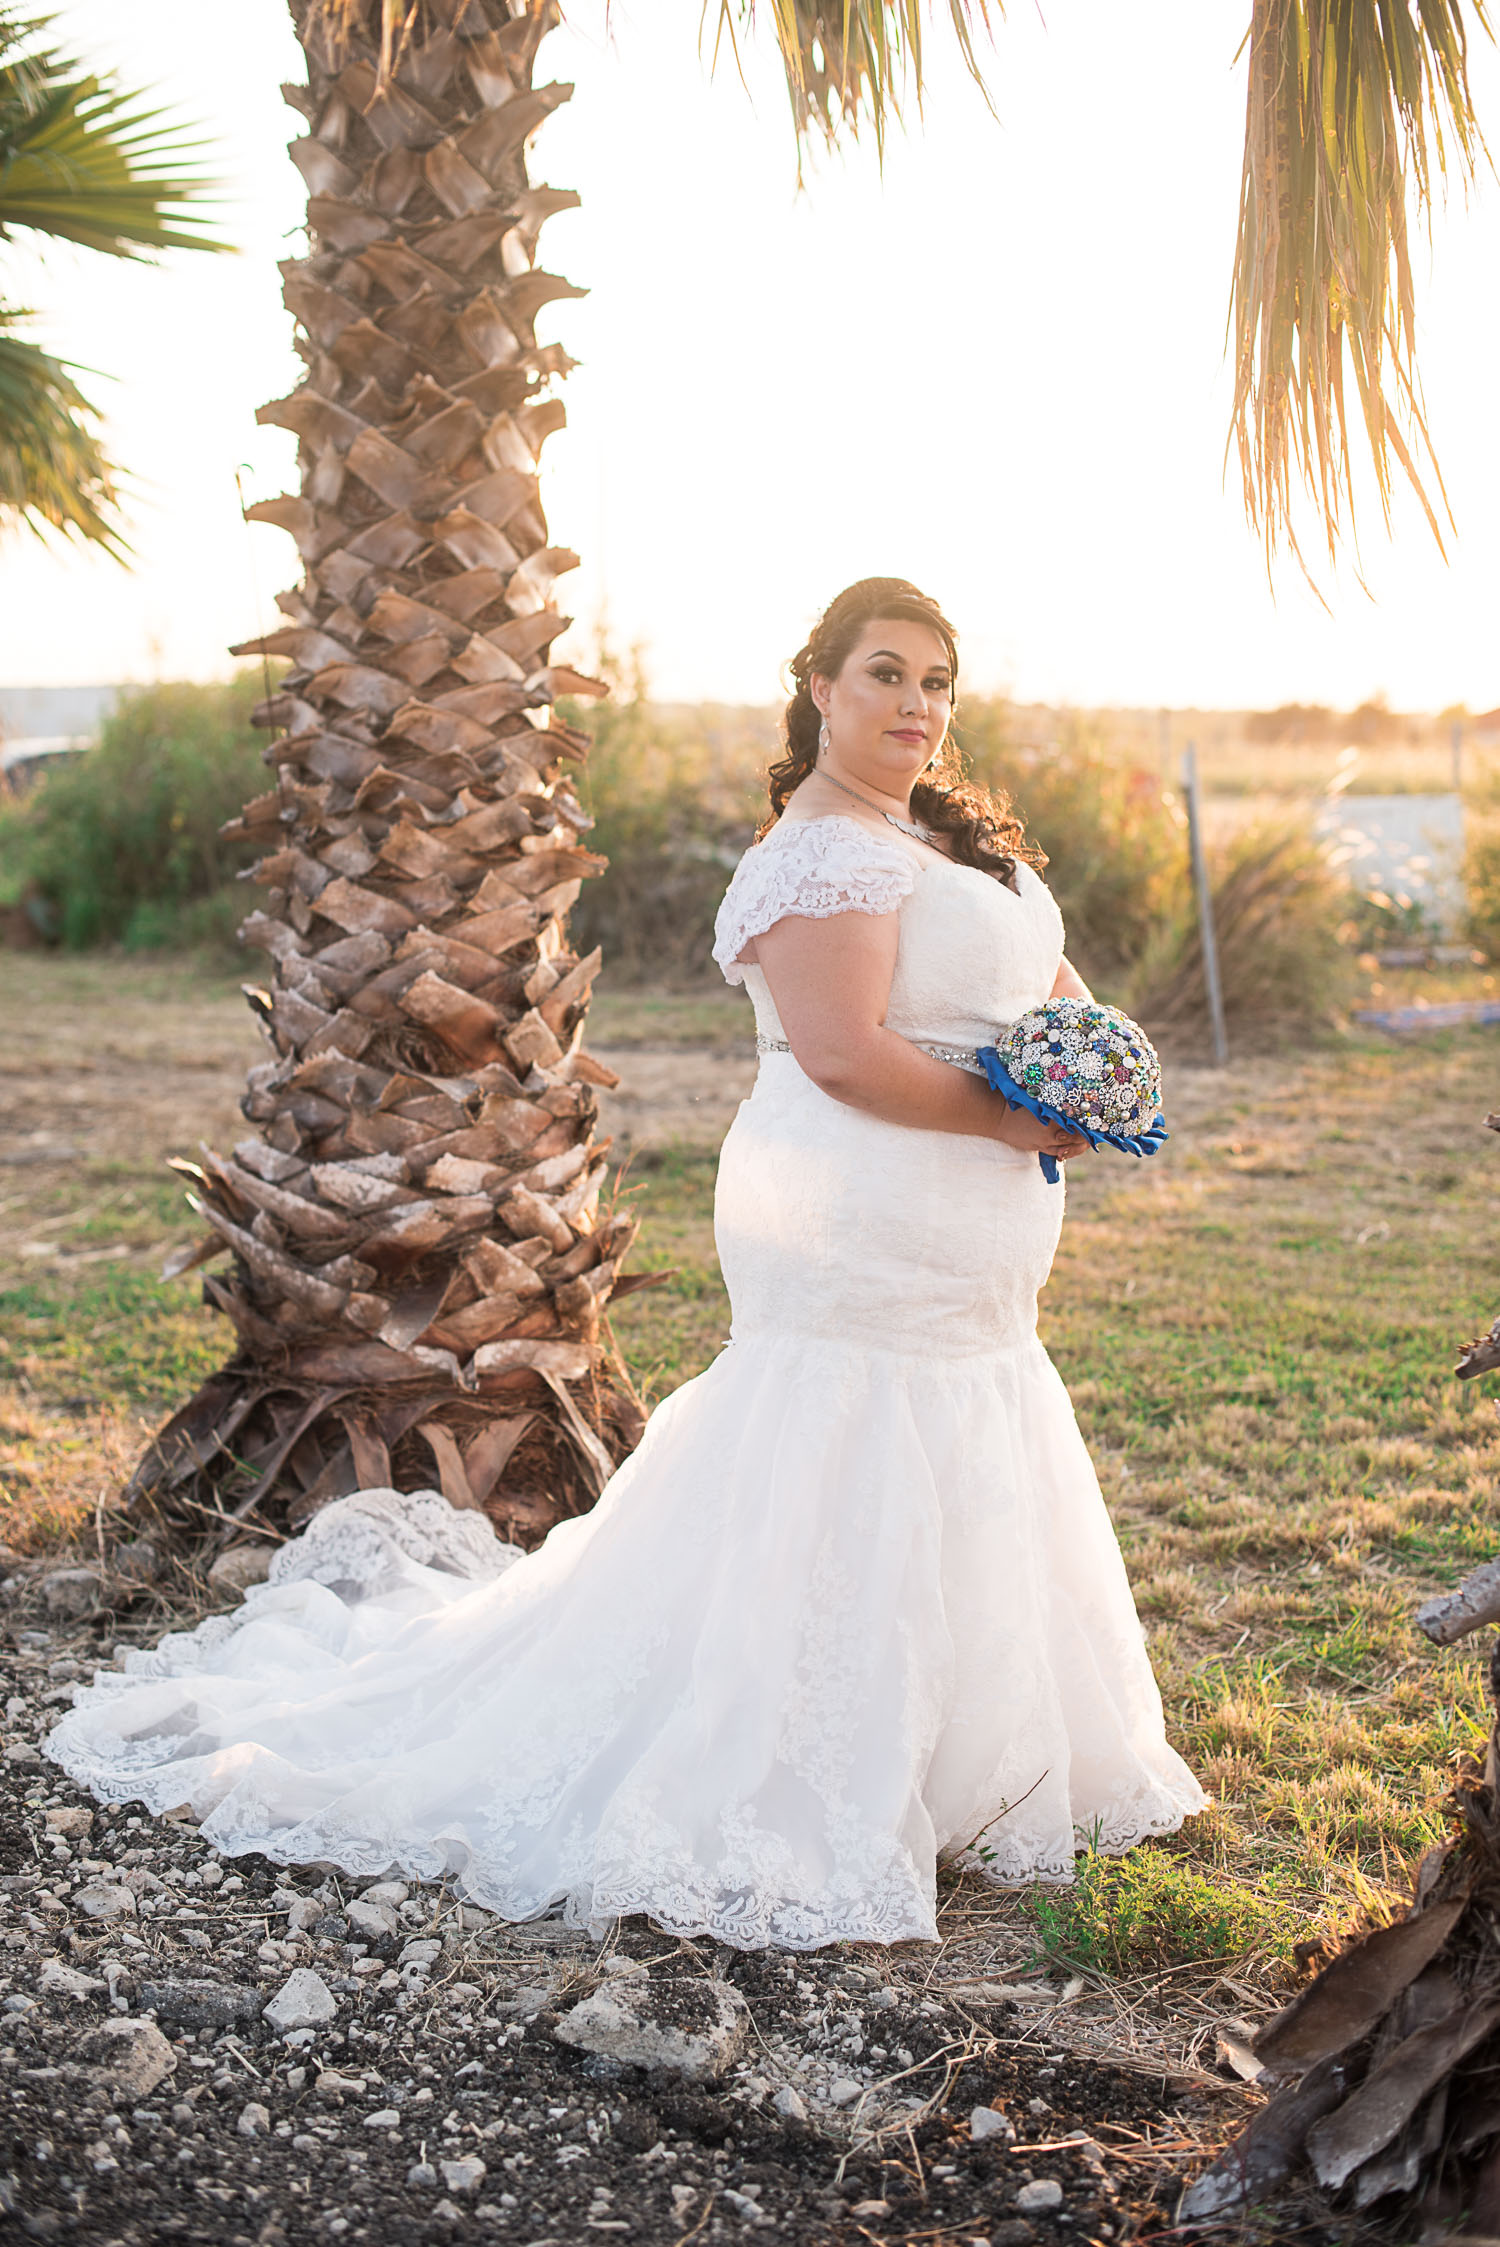 Leal Wedding Mira Visu Photography-127.jpg